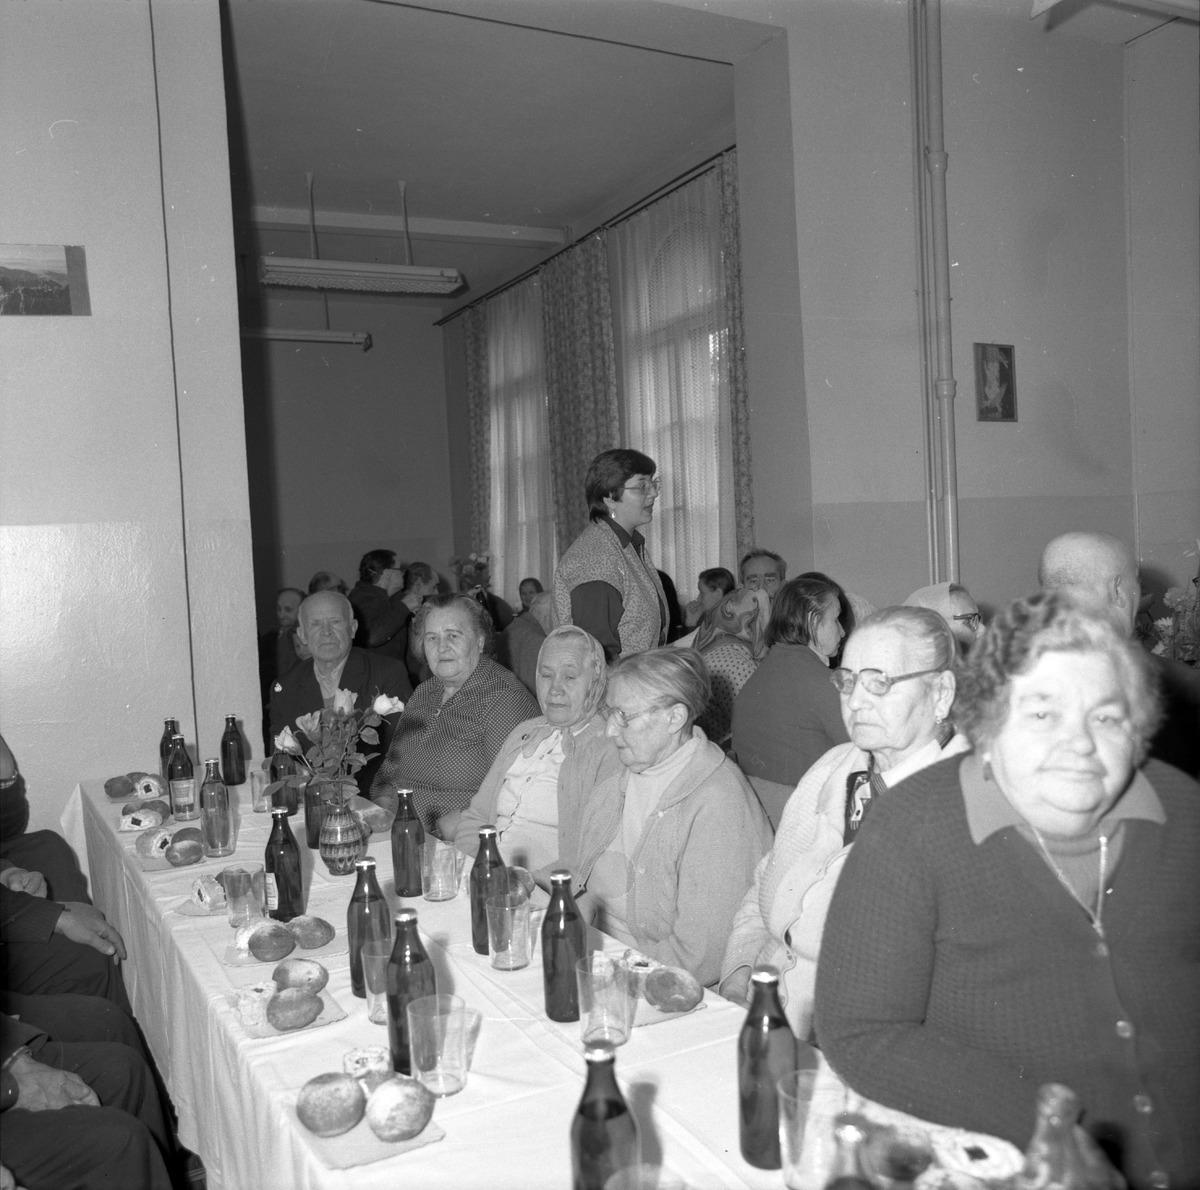 Obchody Dnia Seniora, 1985 r. [8]